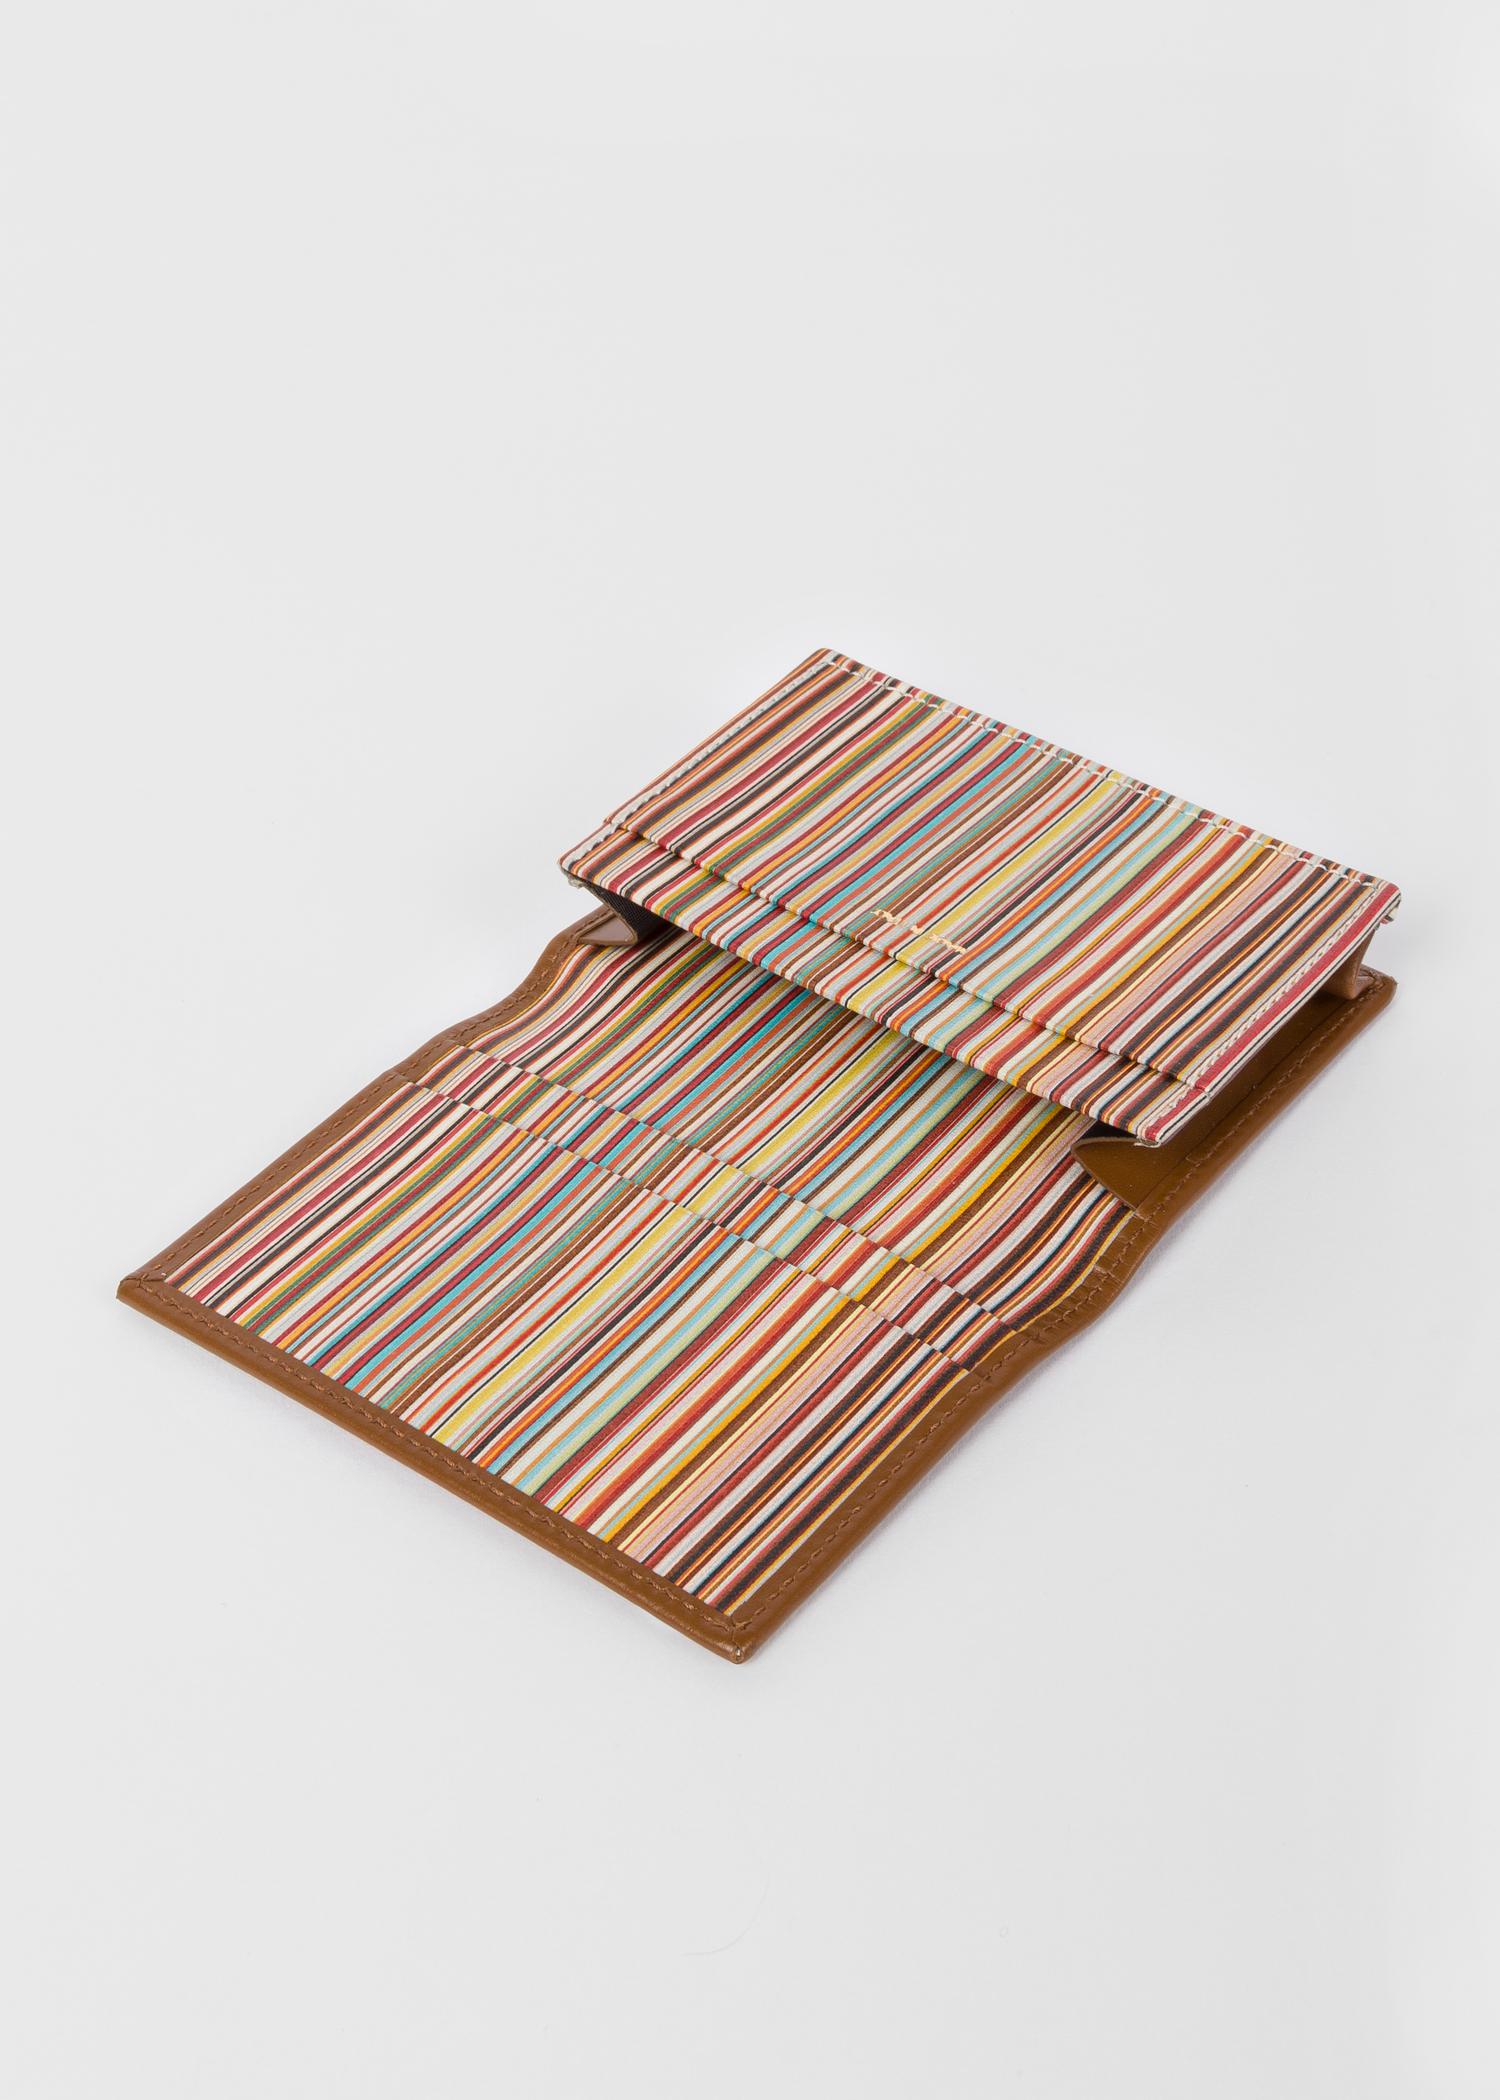 men\u0027s tan leather card wallet with \u0027signature stripe\u0027 interioropen detail men\u0027s tan leather card wallet with \u0027signature stripe\u0027 interior